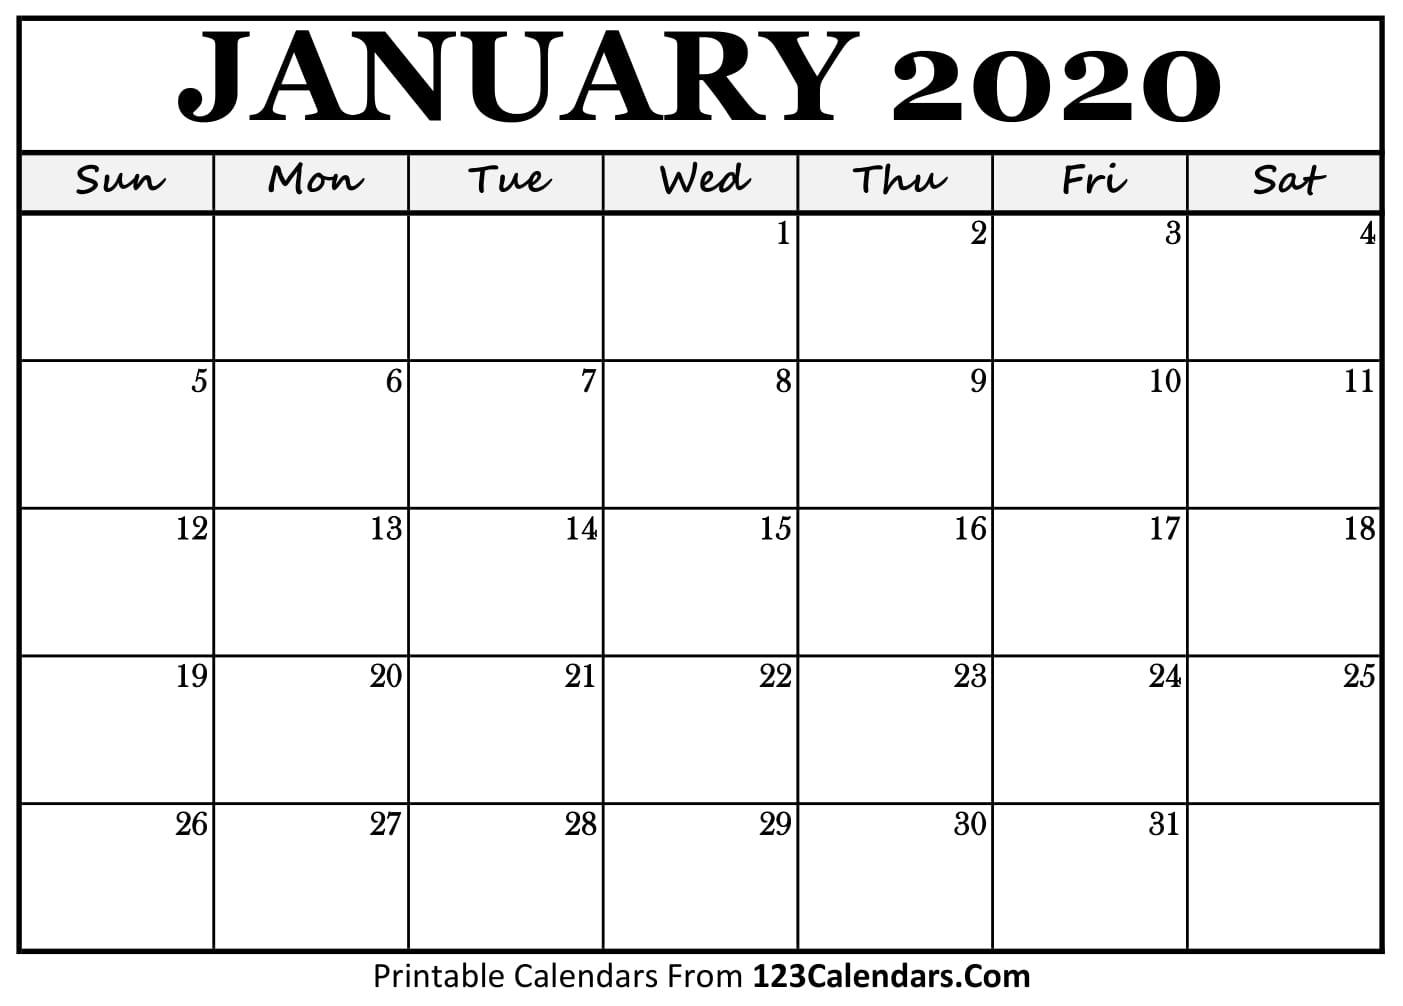 January 2020 Printable Calendar | 123Calendars intended for Jan 2020 Printable Calendar